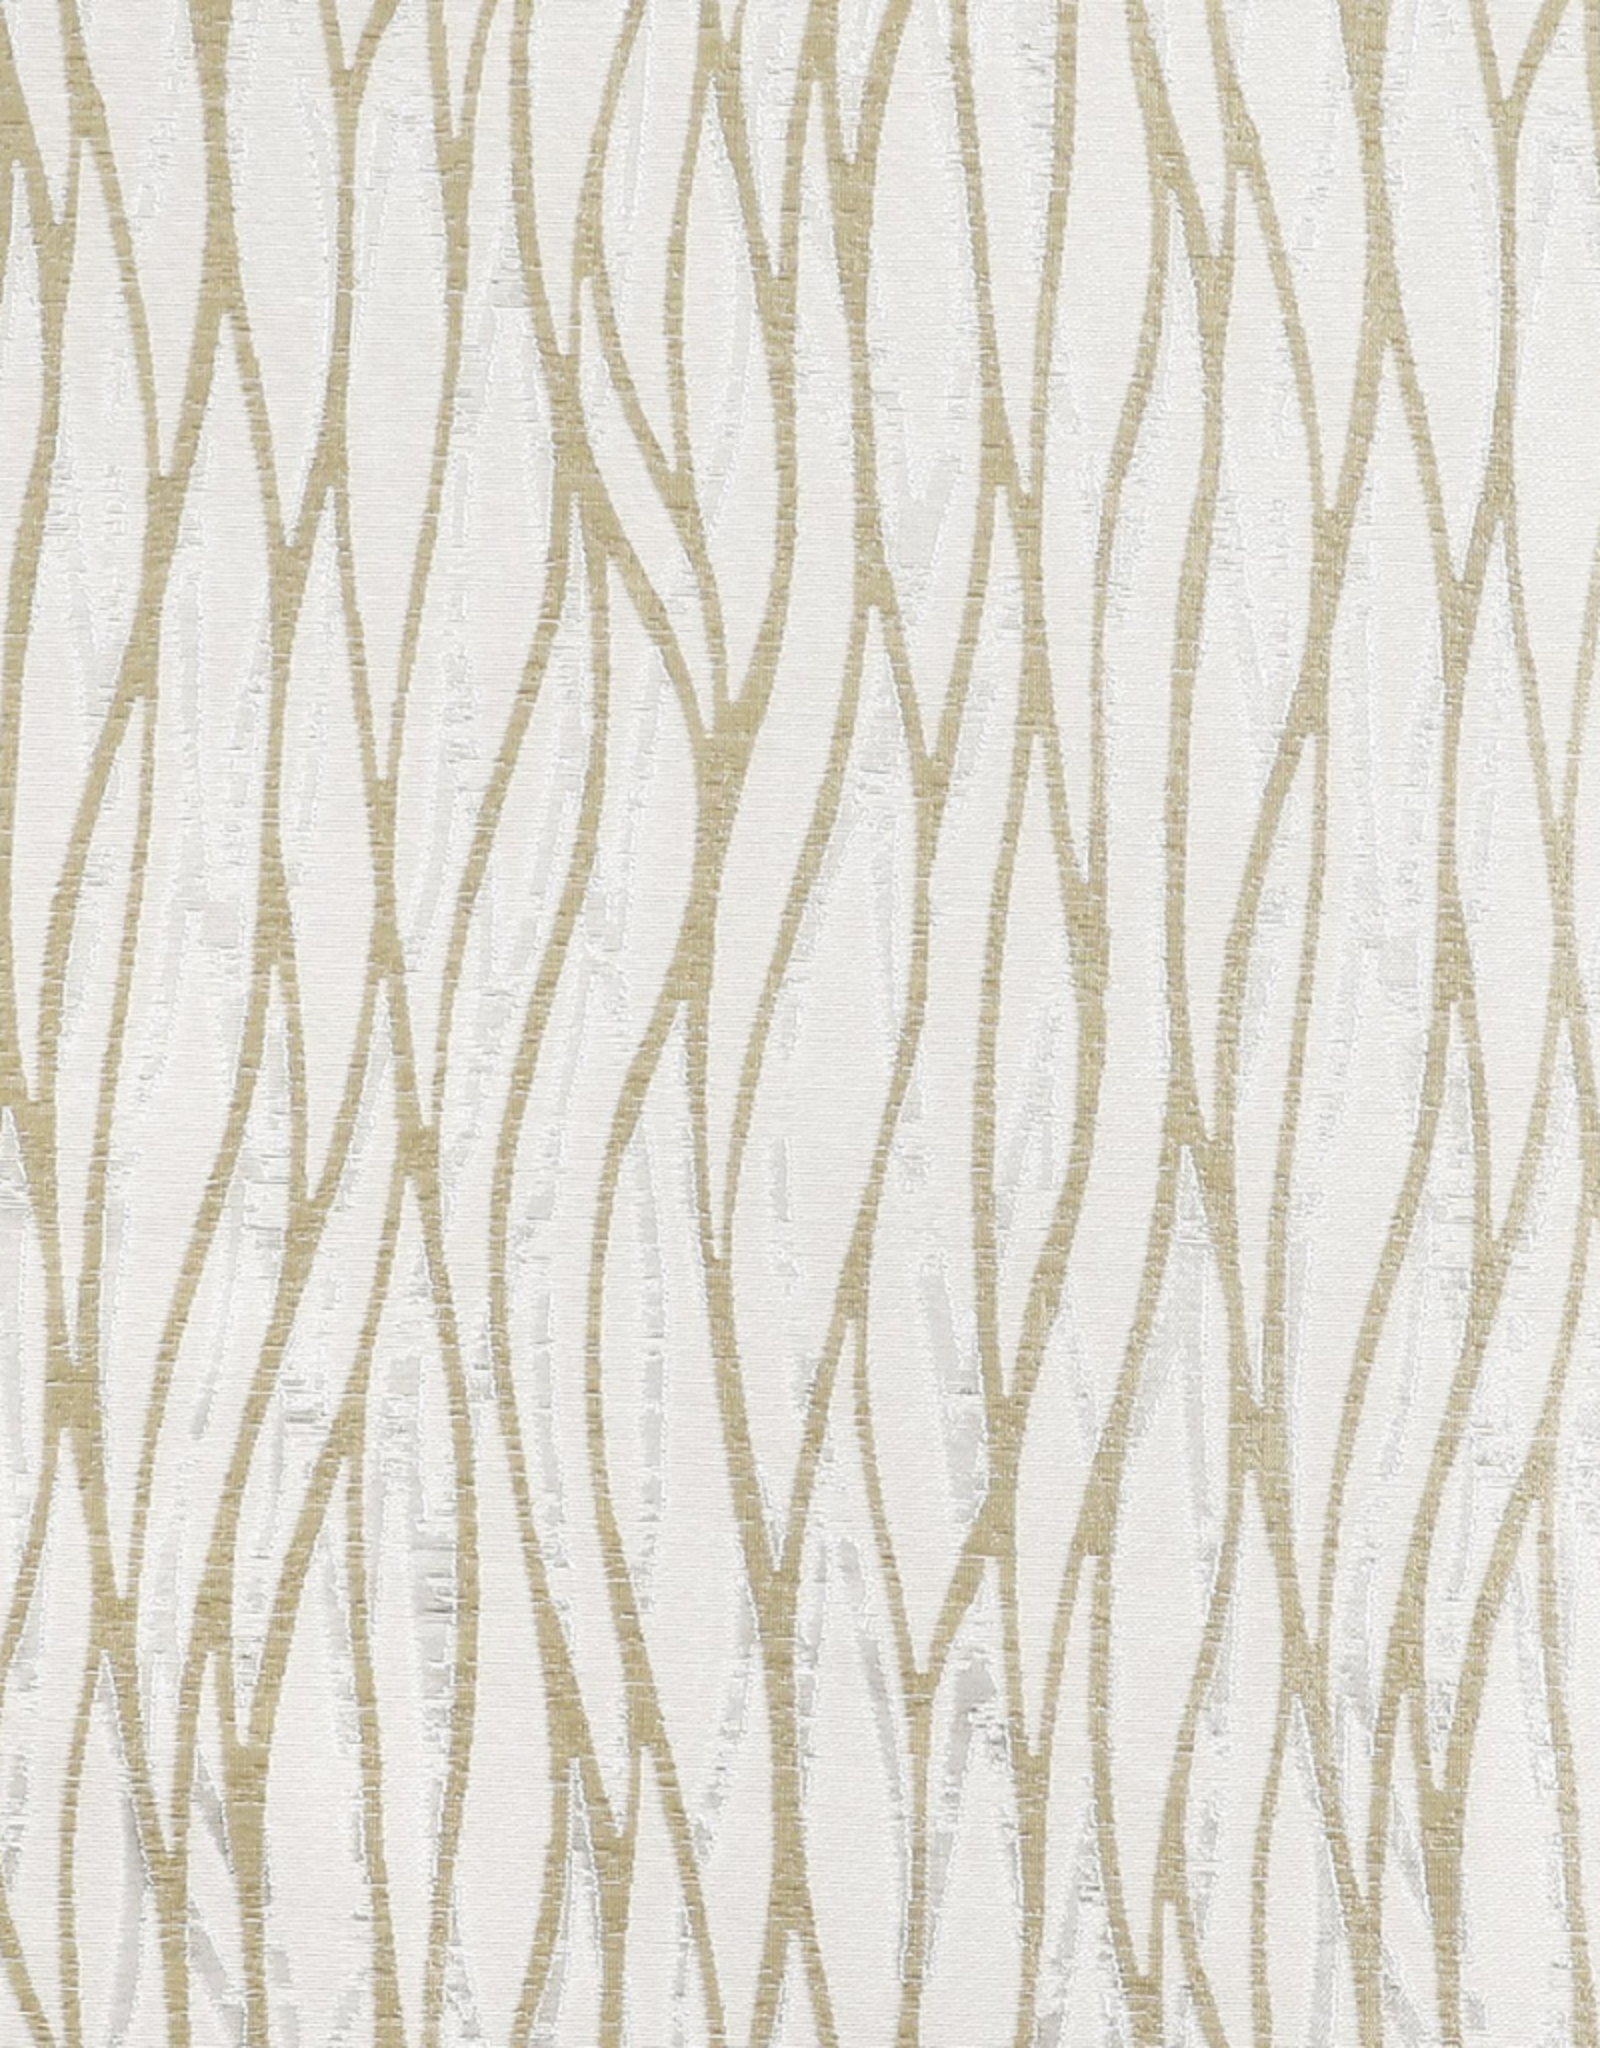 Jacquard Tablecloth White/Silver/Gold TC1318